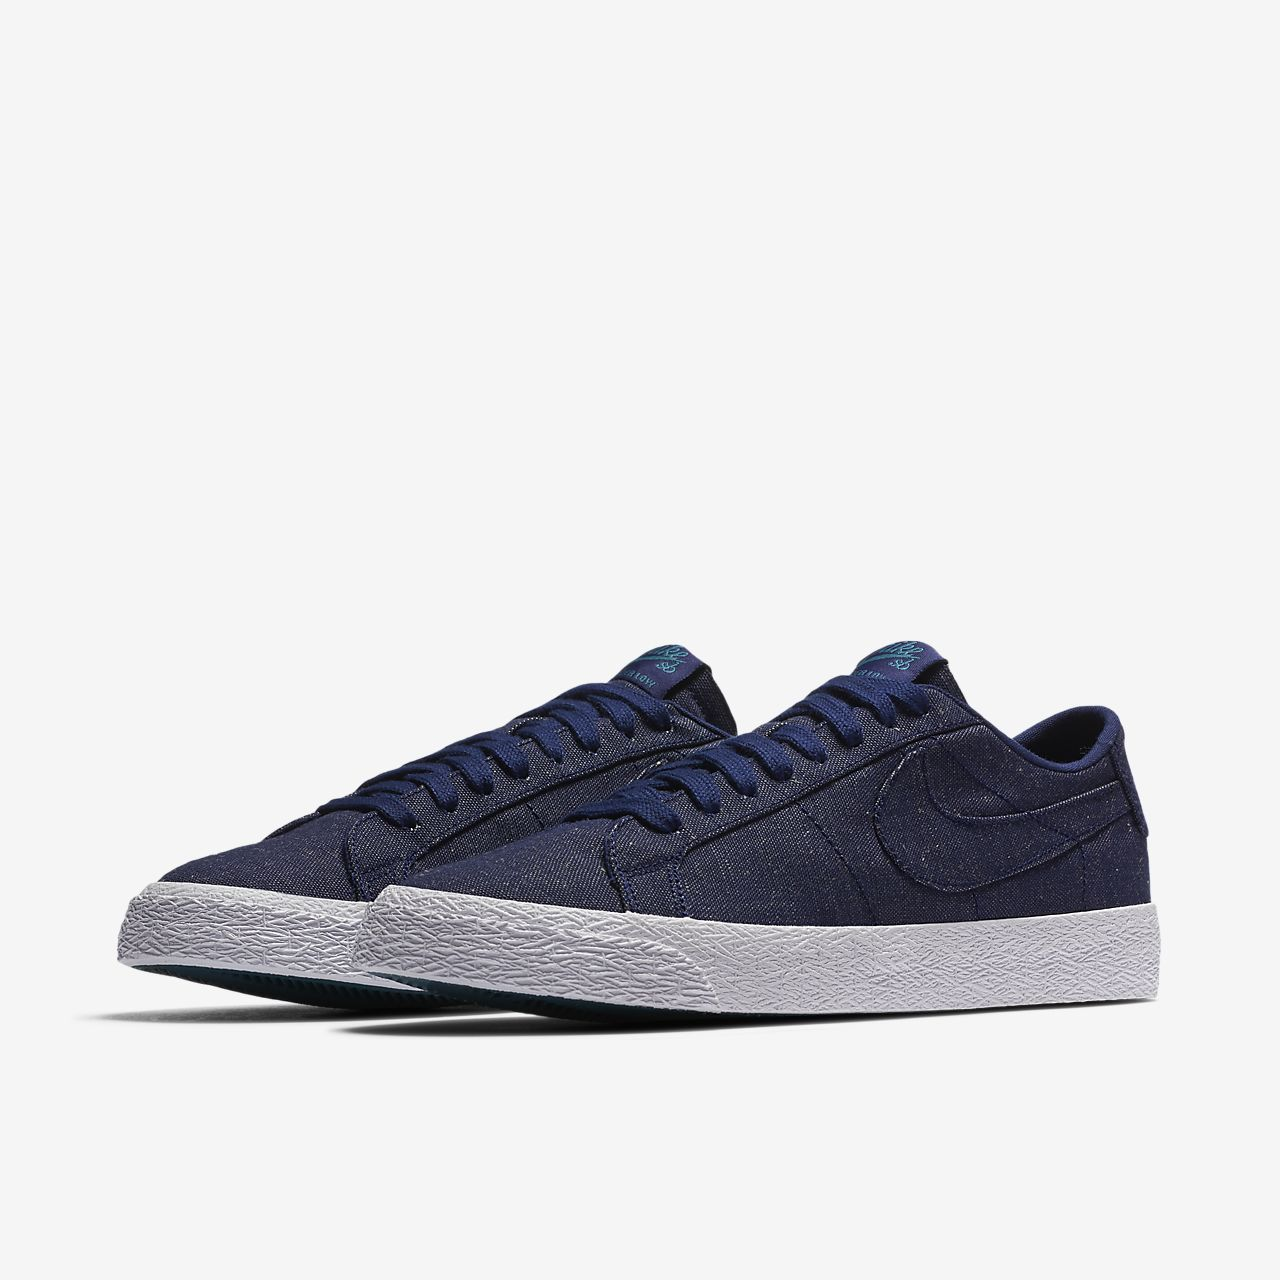 030bb2ae7cba ... Nike SB Zoom Blazer Low Canvas Deconstructed Men s Skateboarding Shoe